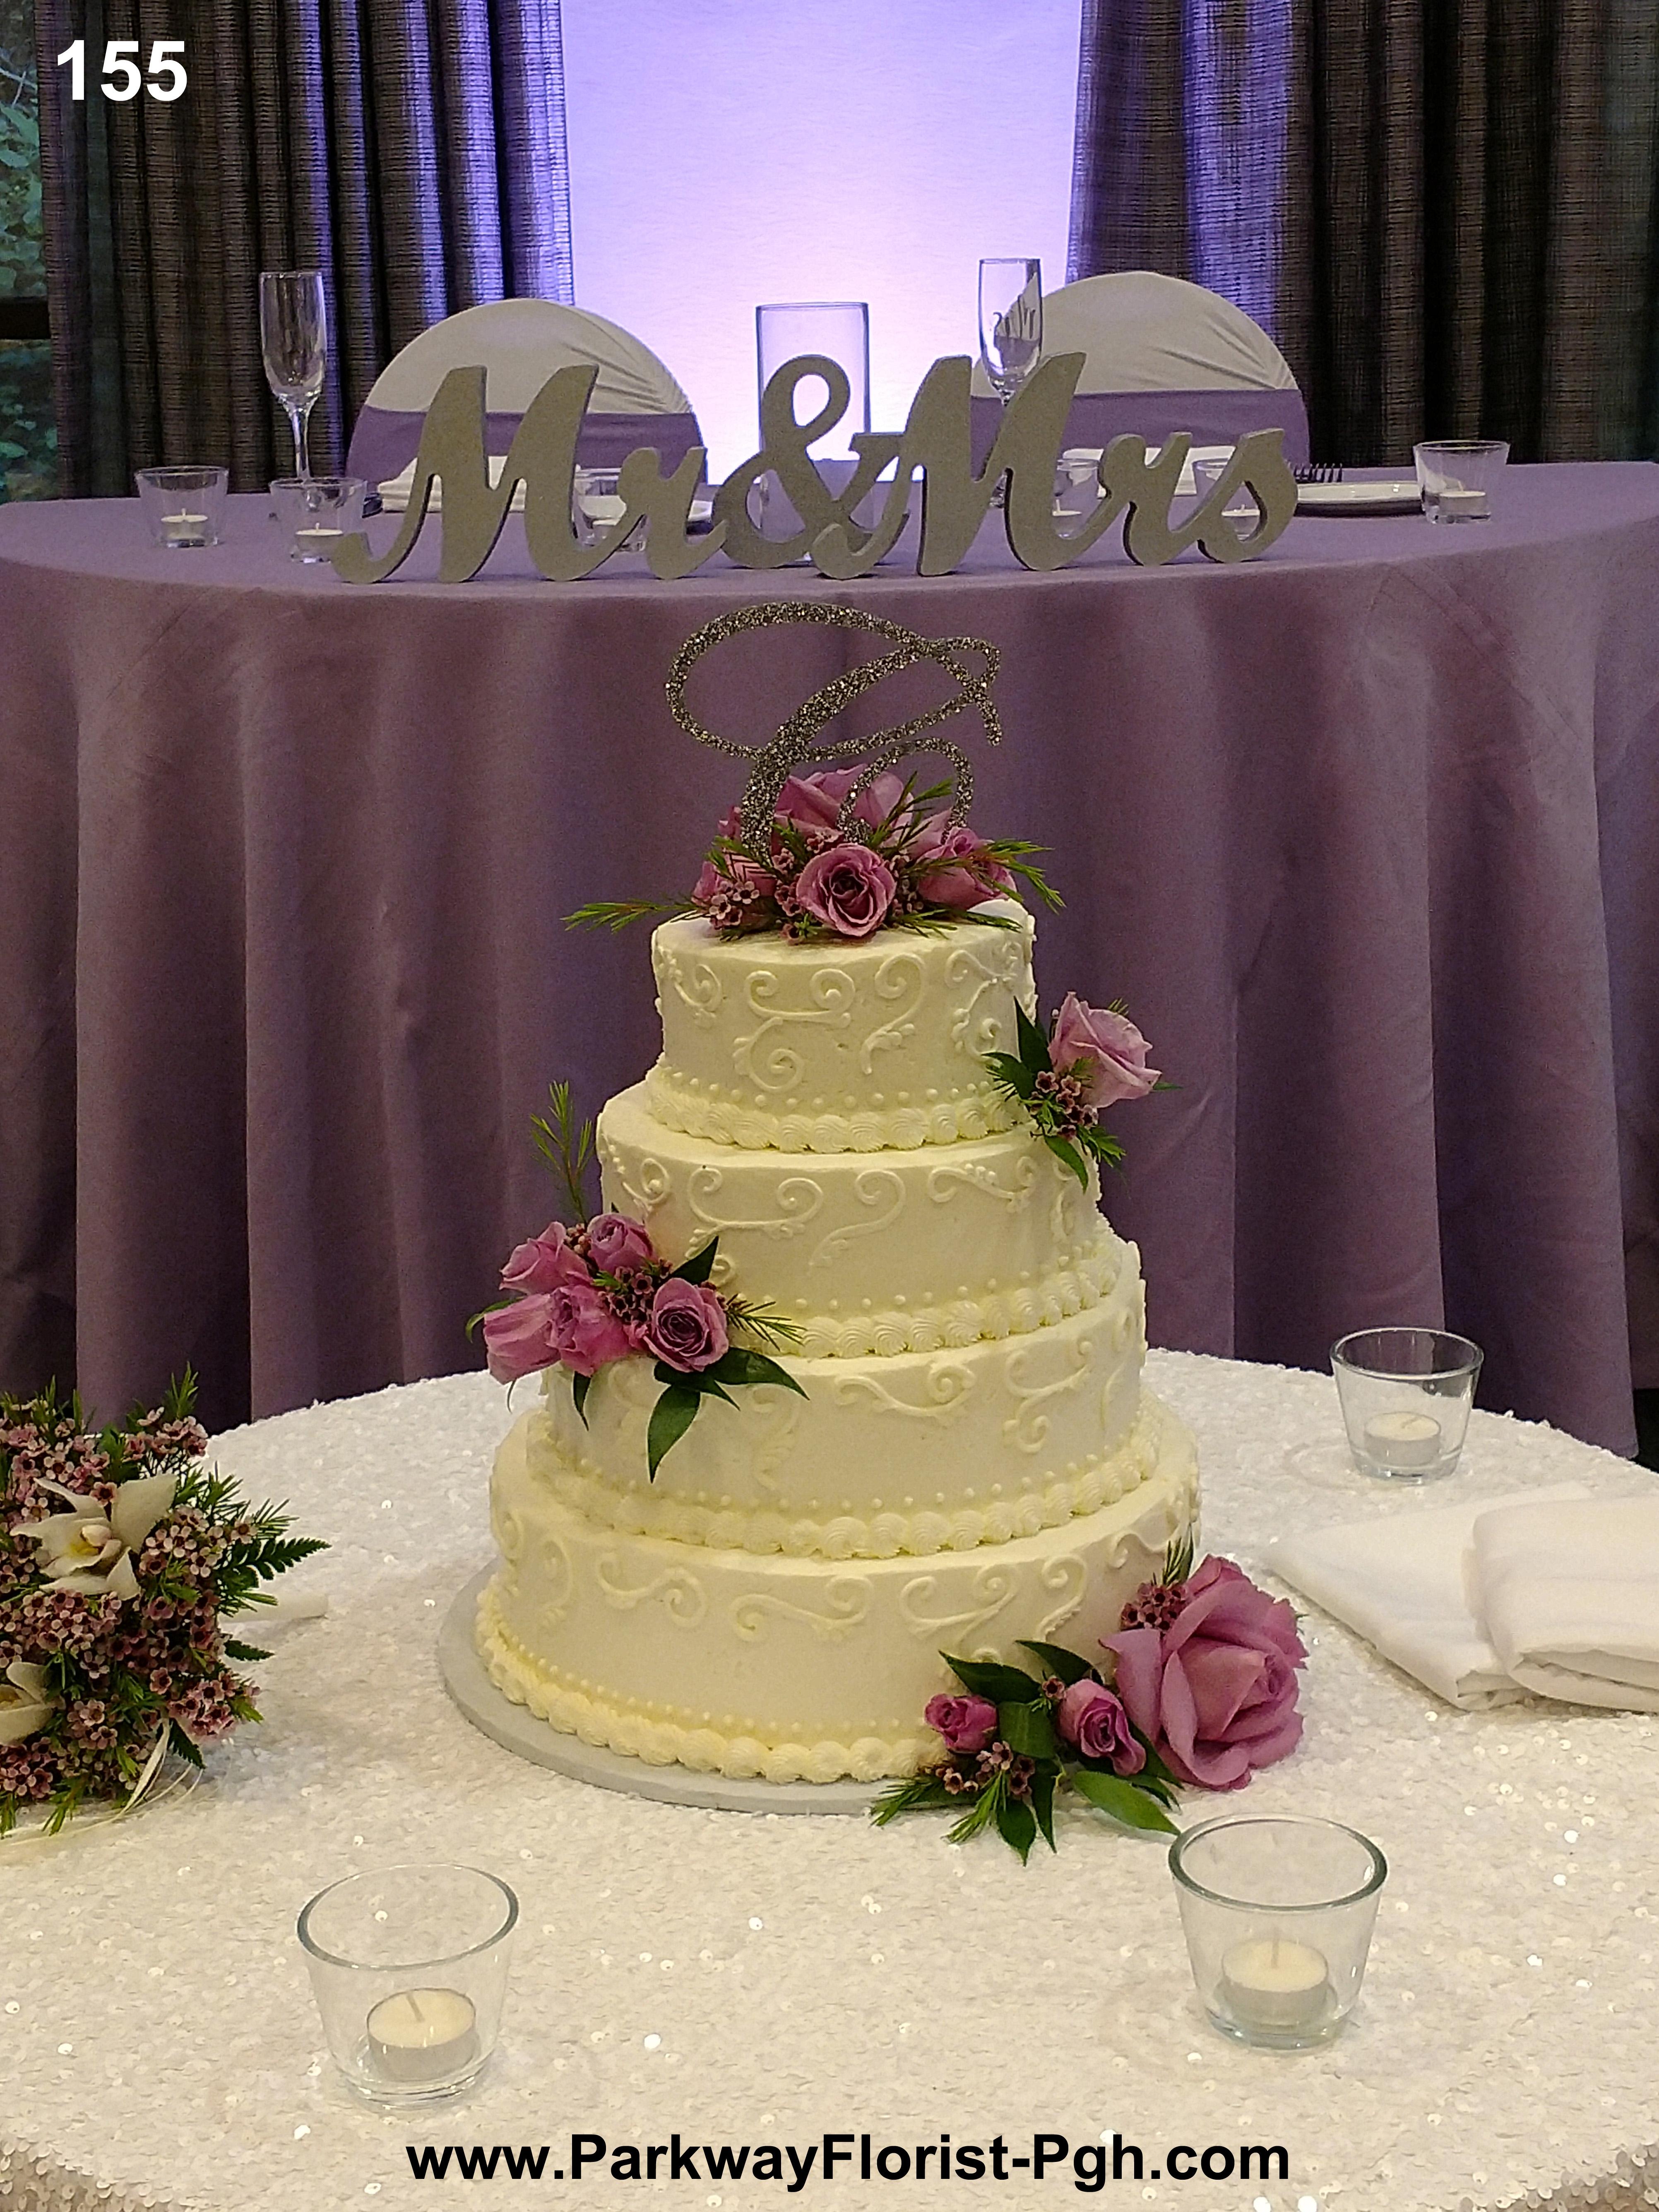 cake 155.jpg